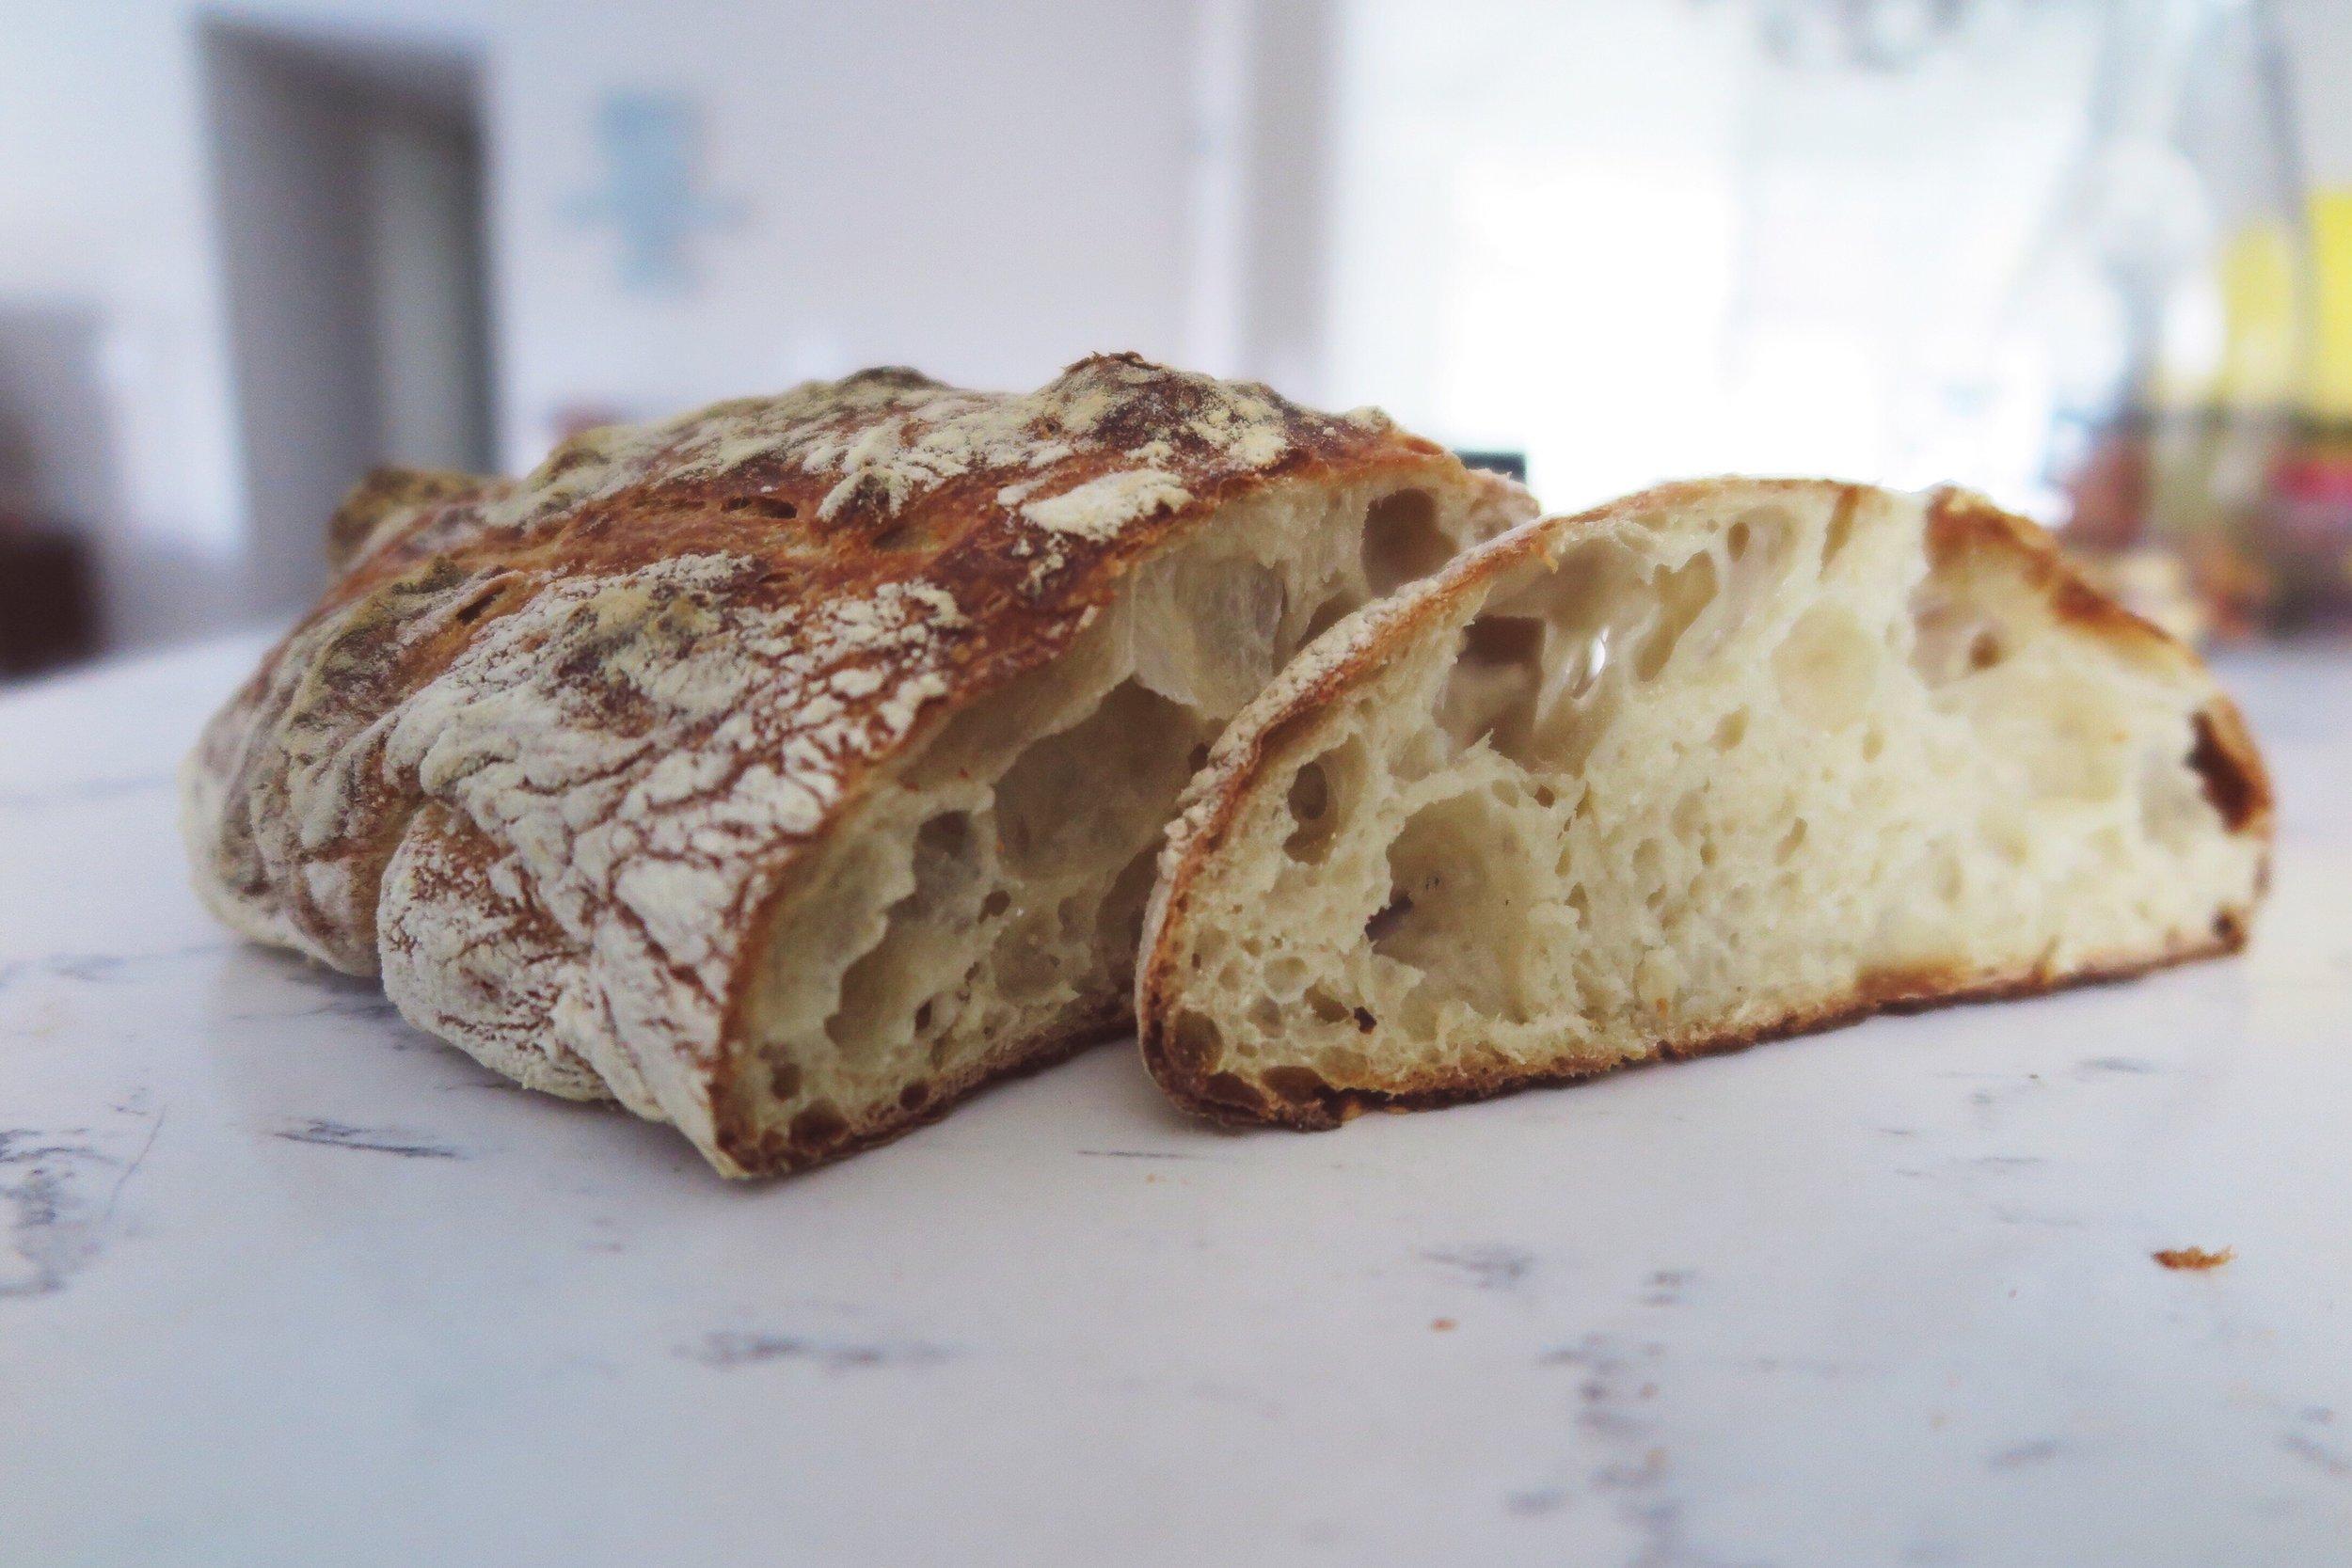 five-myths-of-meal-planning-homemade-sourdough-bread-fermentation.jpg